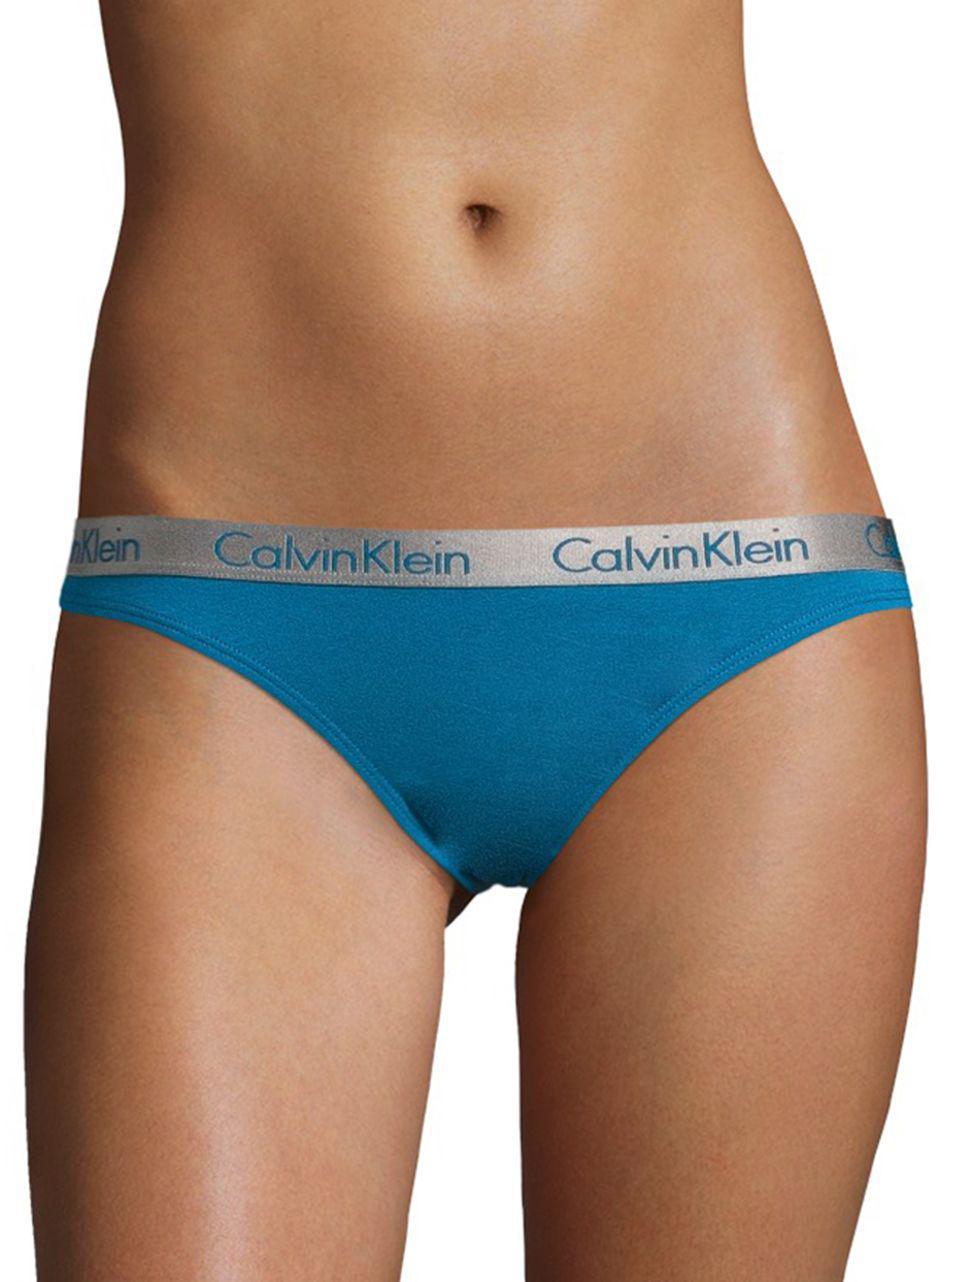 b5d380ba7f Lyst - Calvin Klein Radiant Cotton Thong in Blue